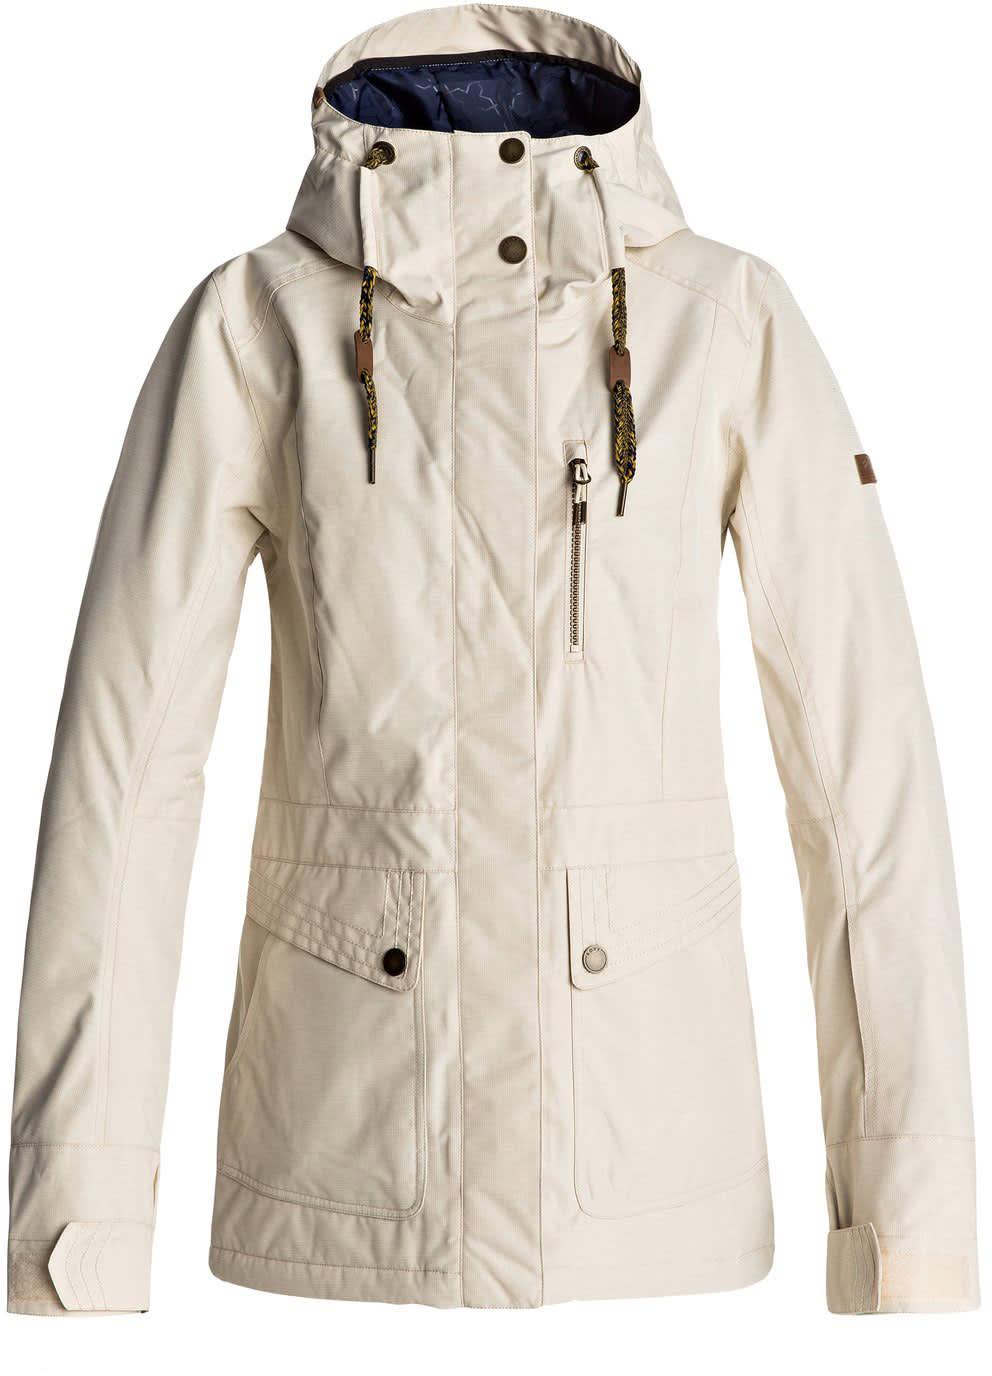 Roxy Ski Jacket